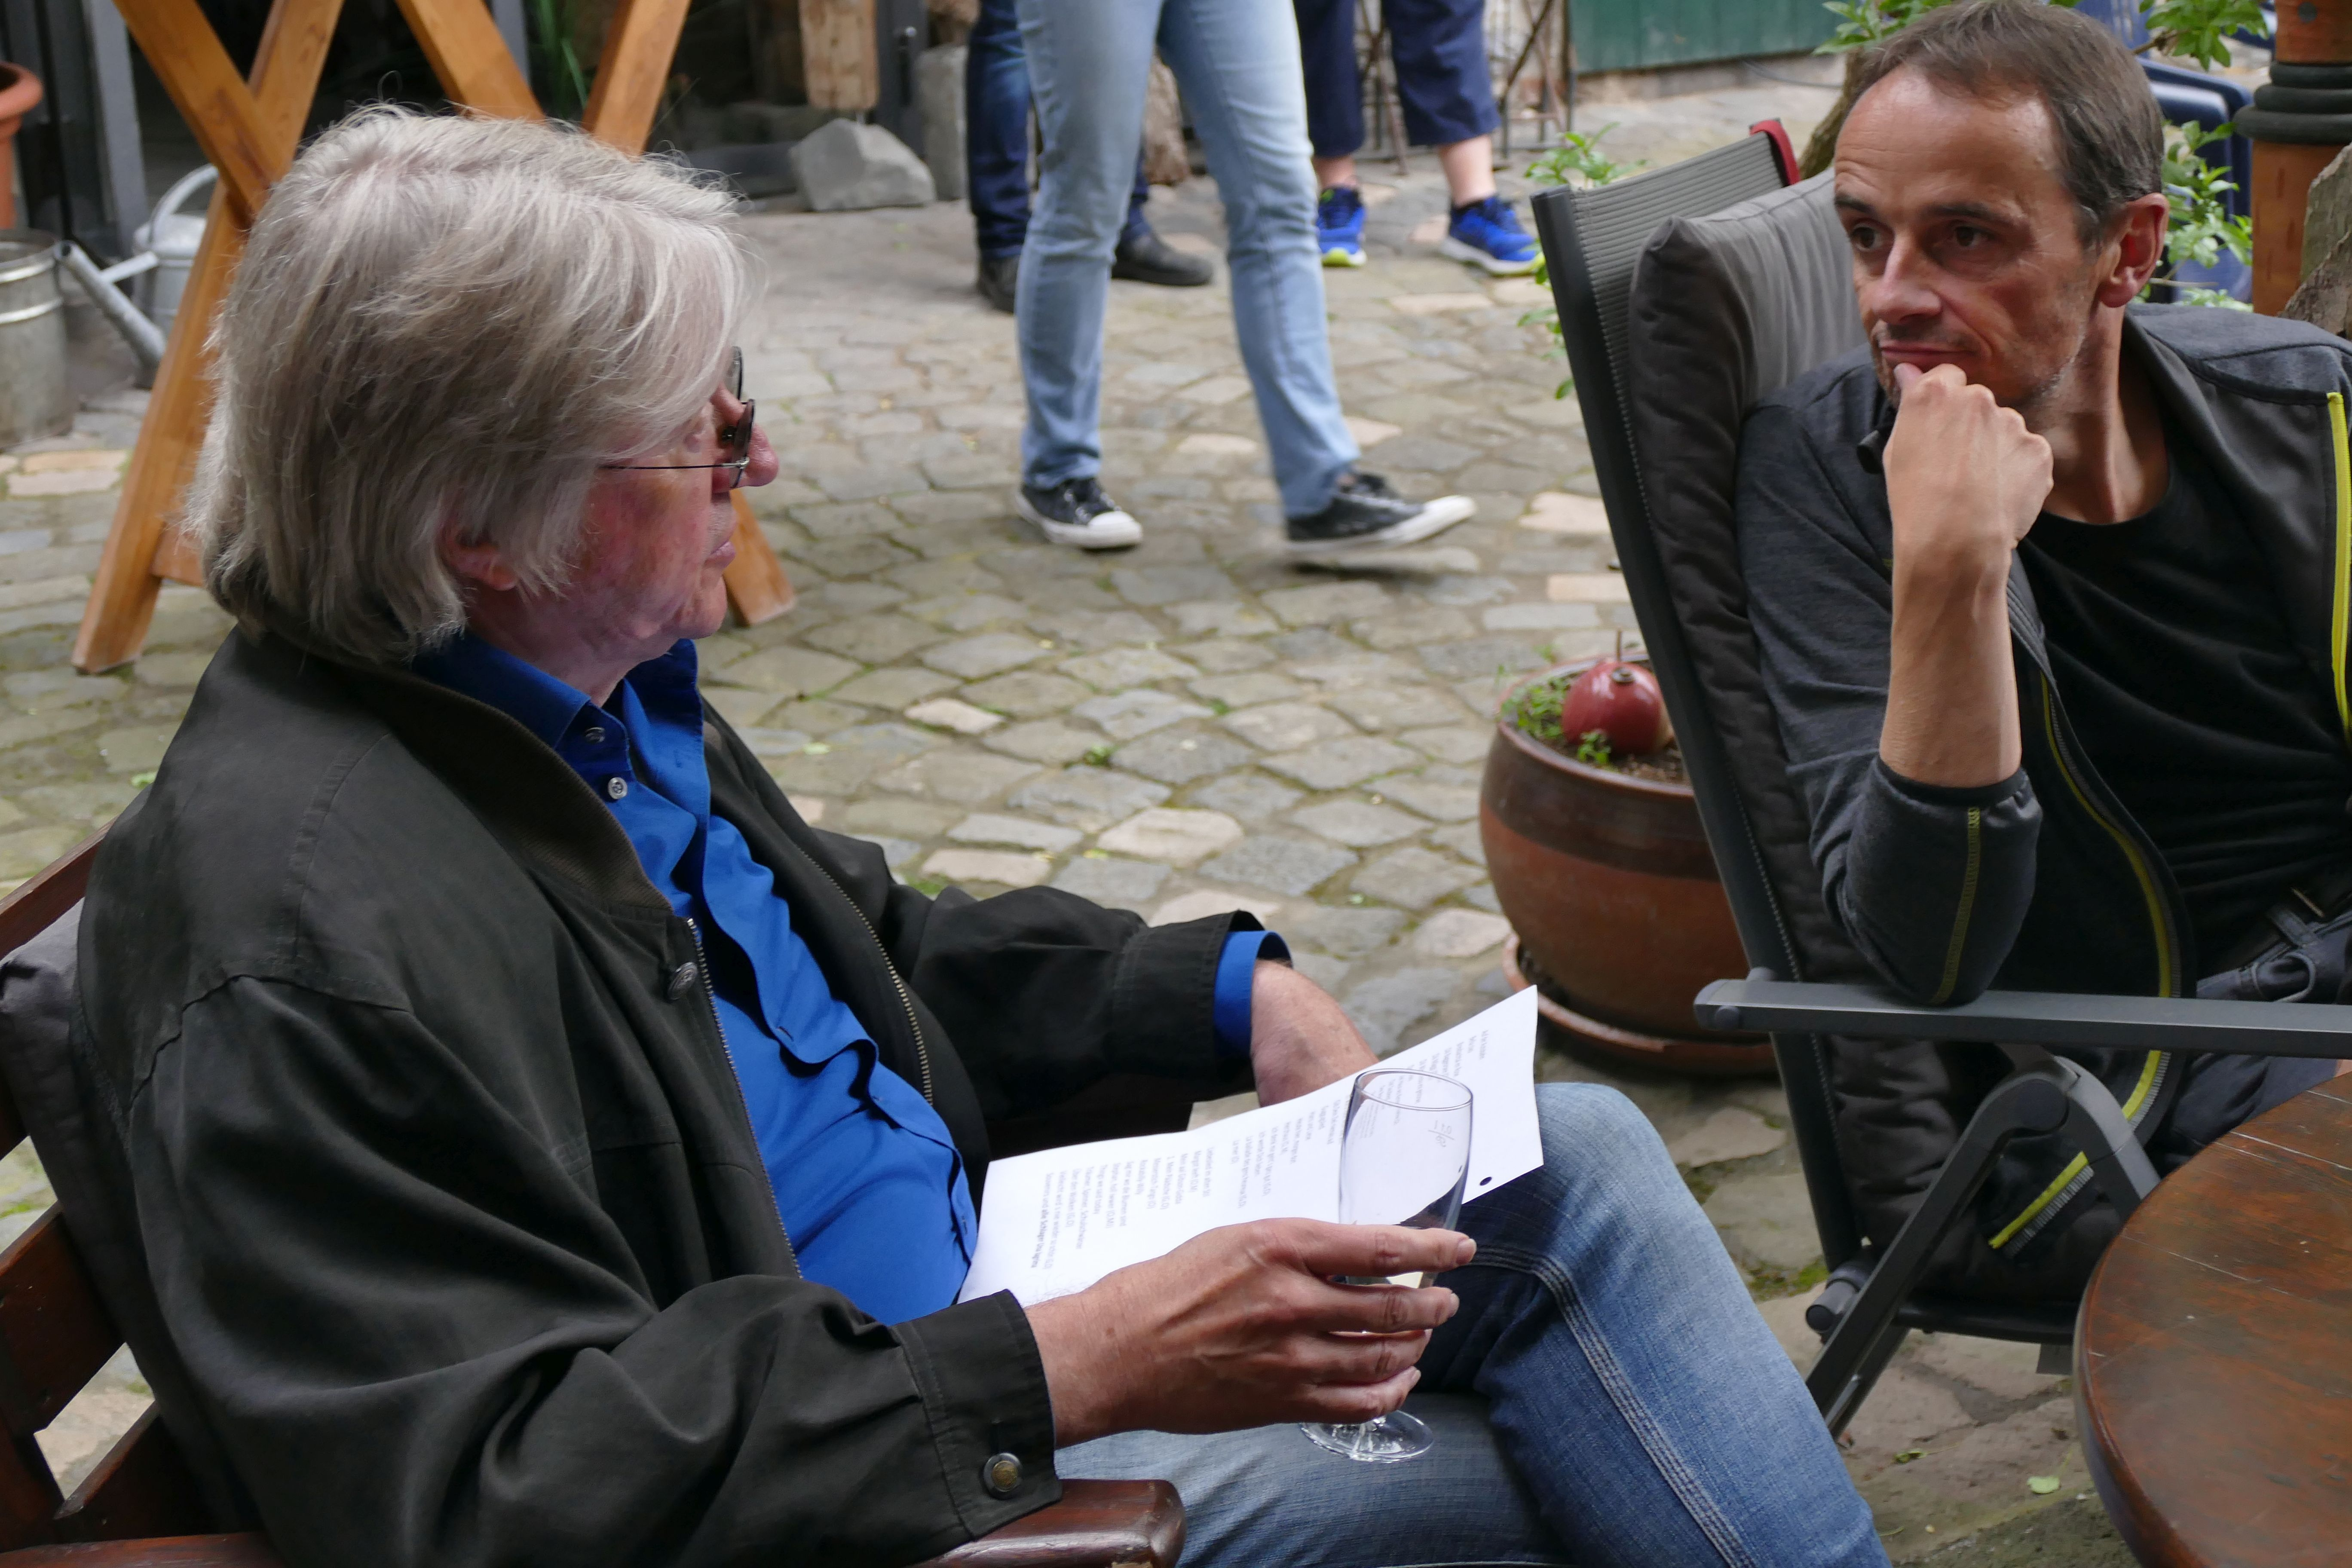 Manfred Pohlmann, Stefan Gemmel